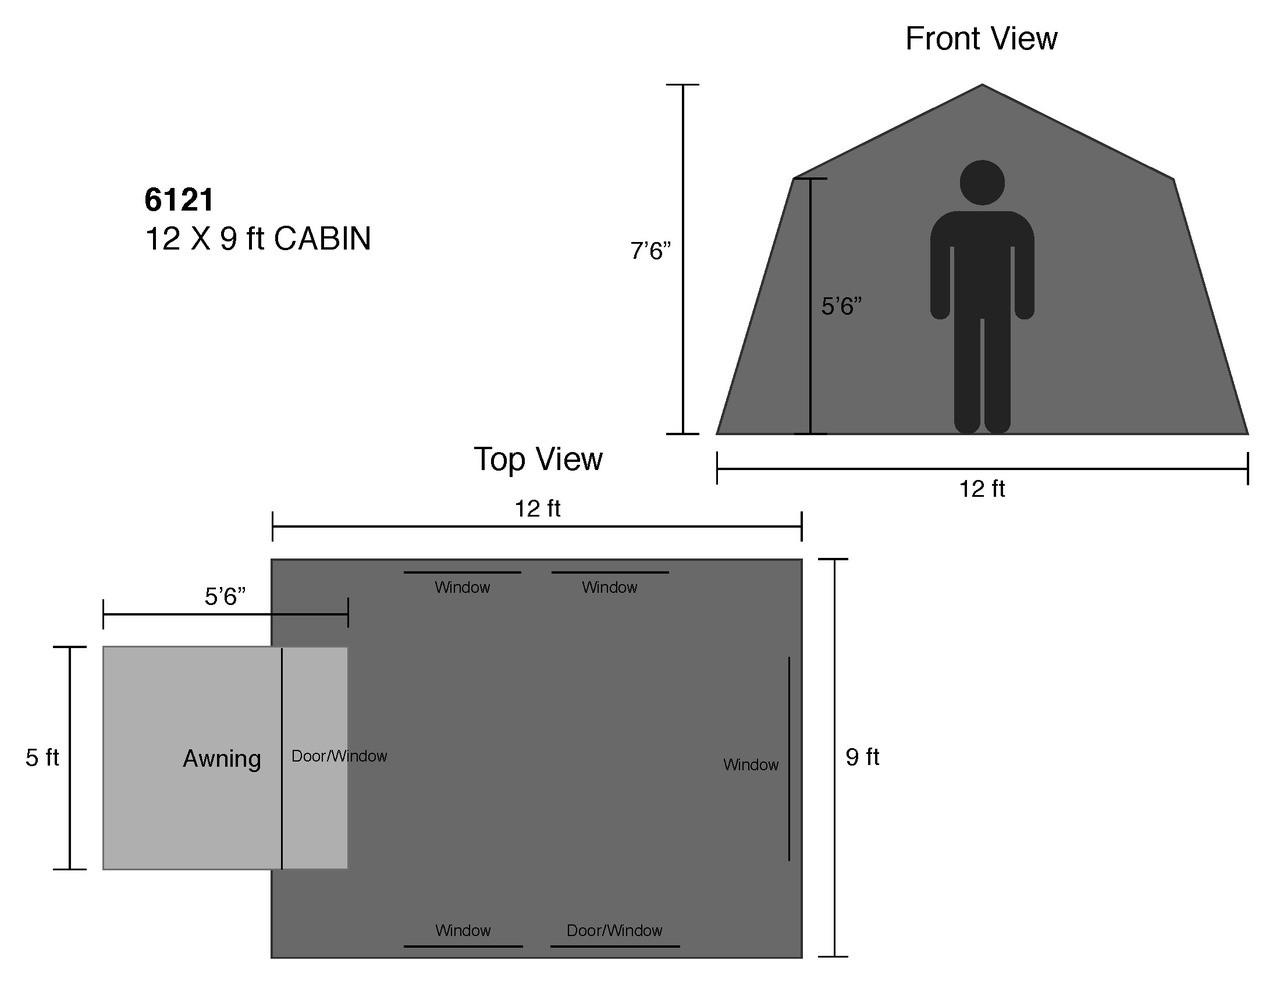 12 x 9 ft. Cabin - Estimated Restock Date Sep. 1st, 2021